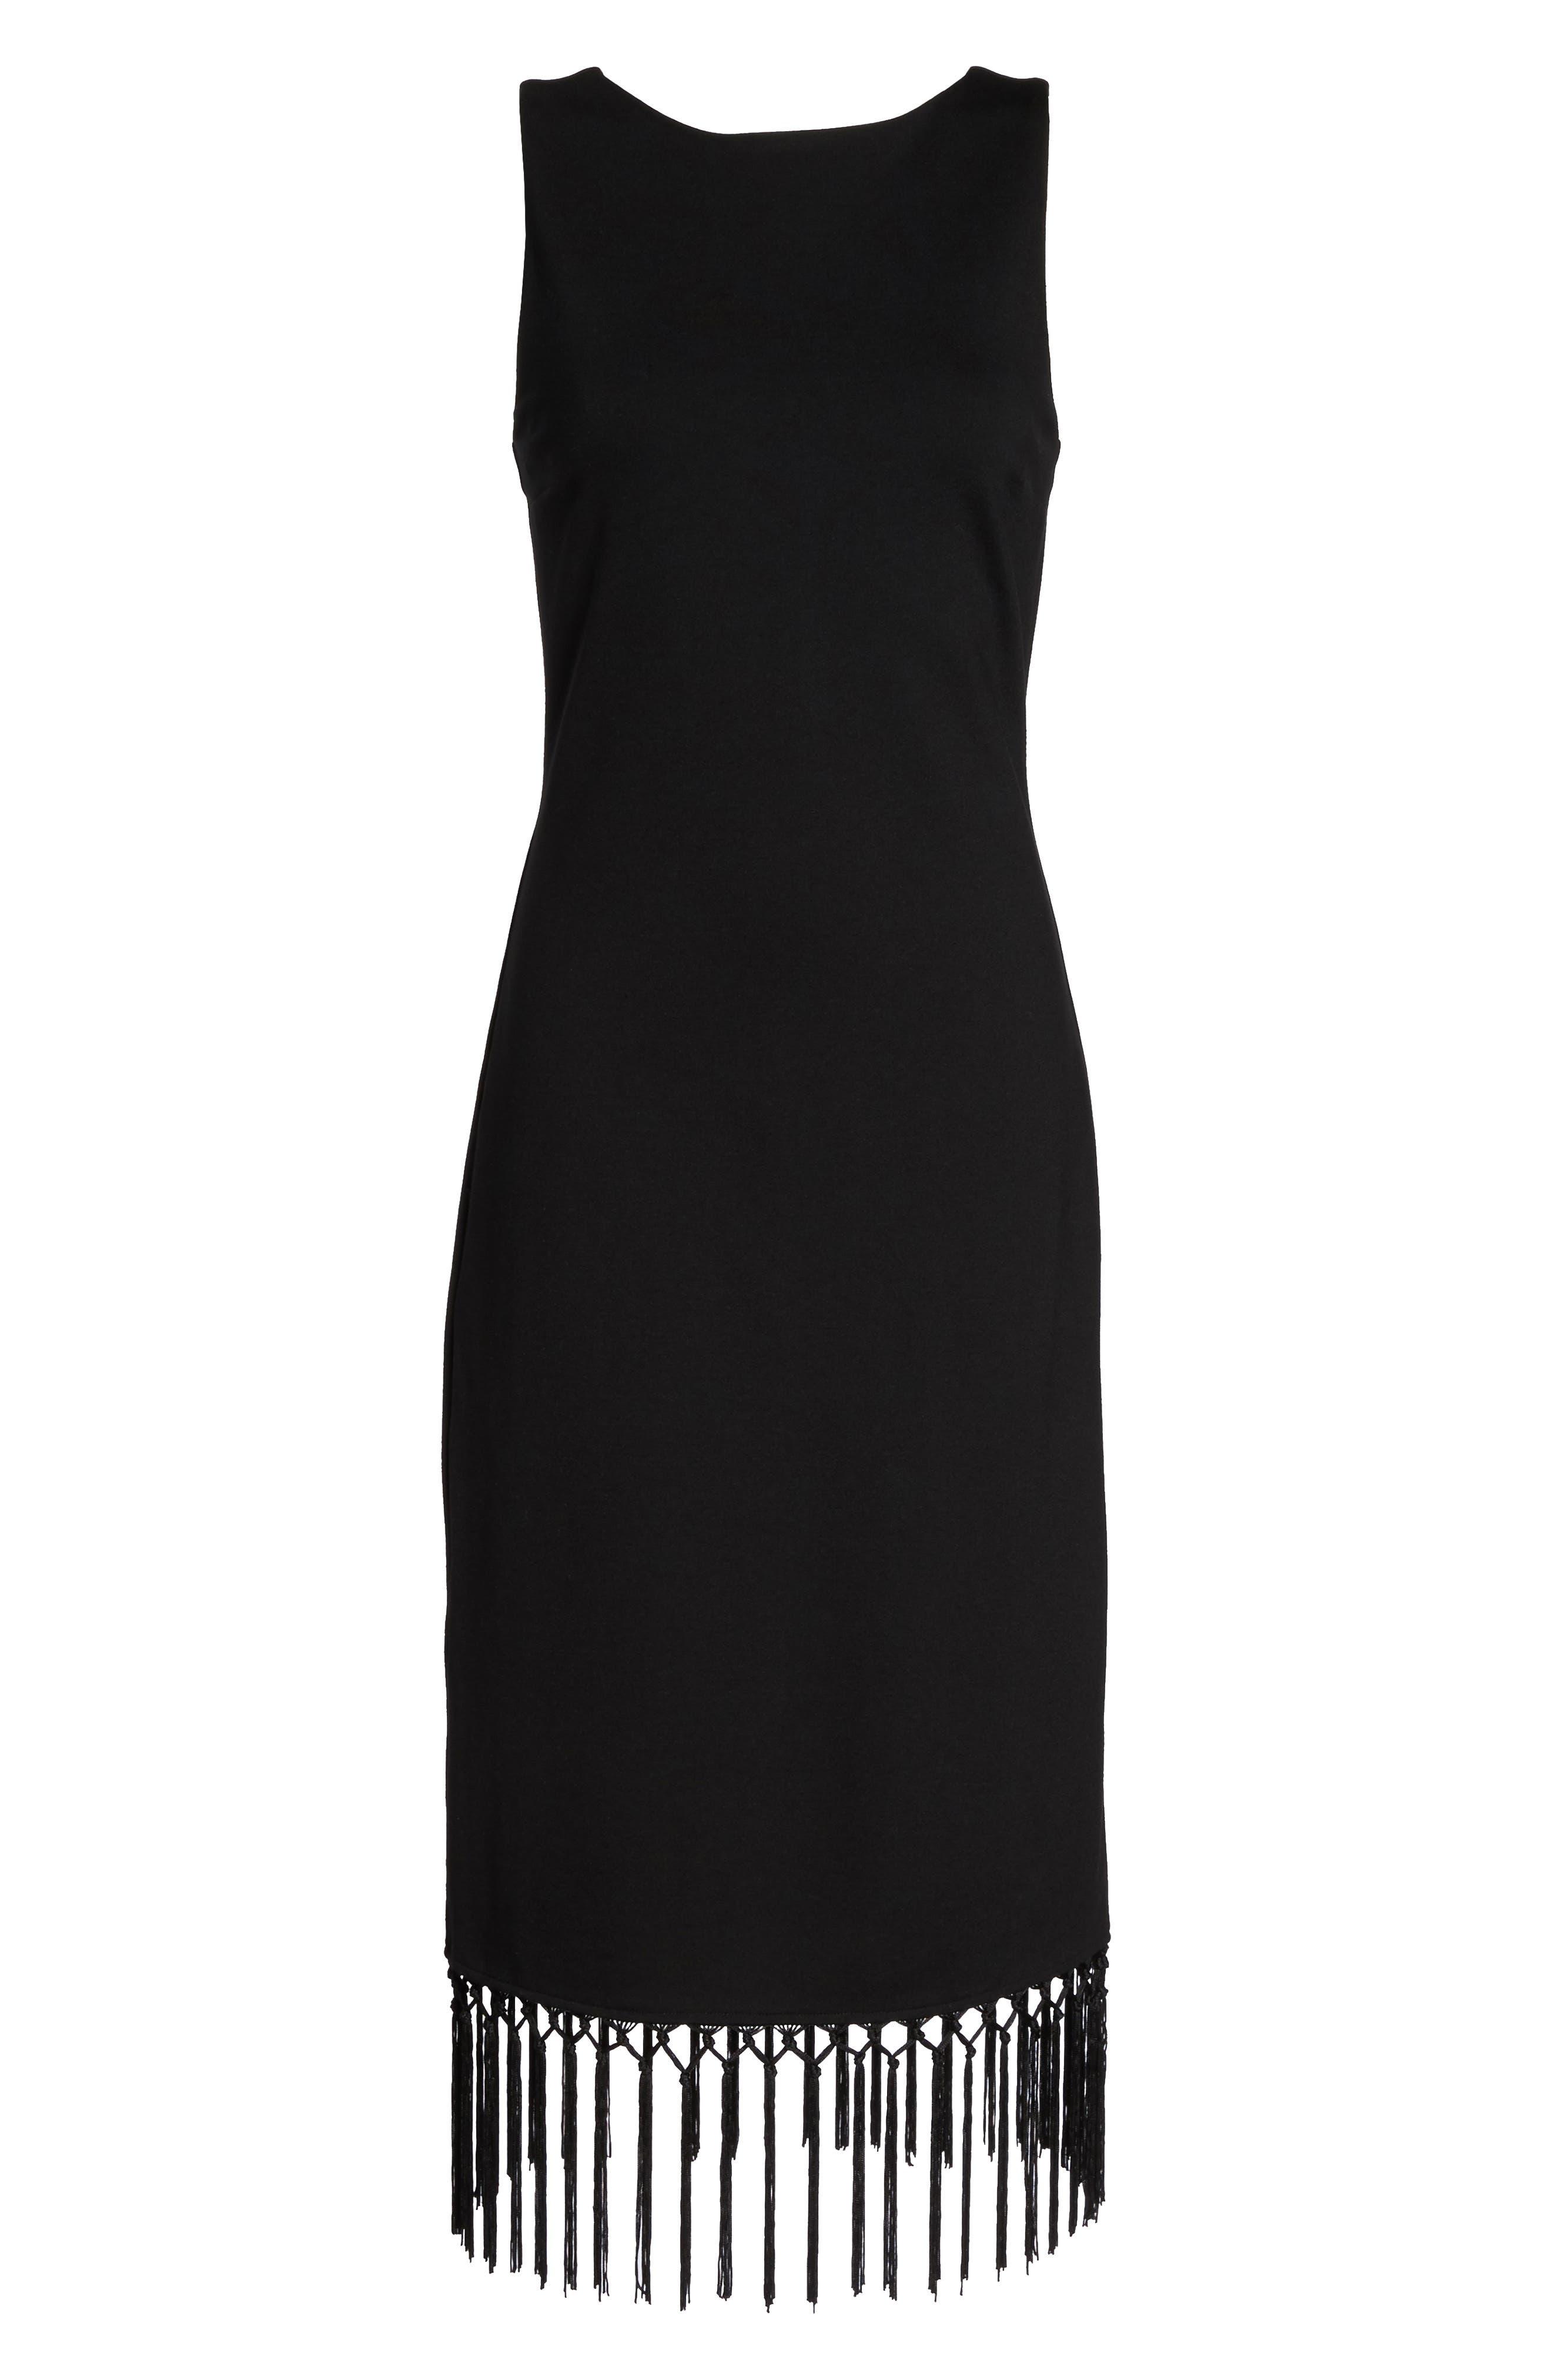 Tassel Midi Dress,                             Alternate thumbnail 6, color,                             Black